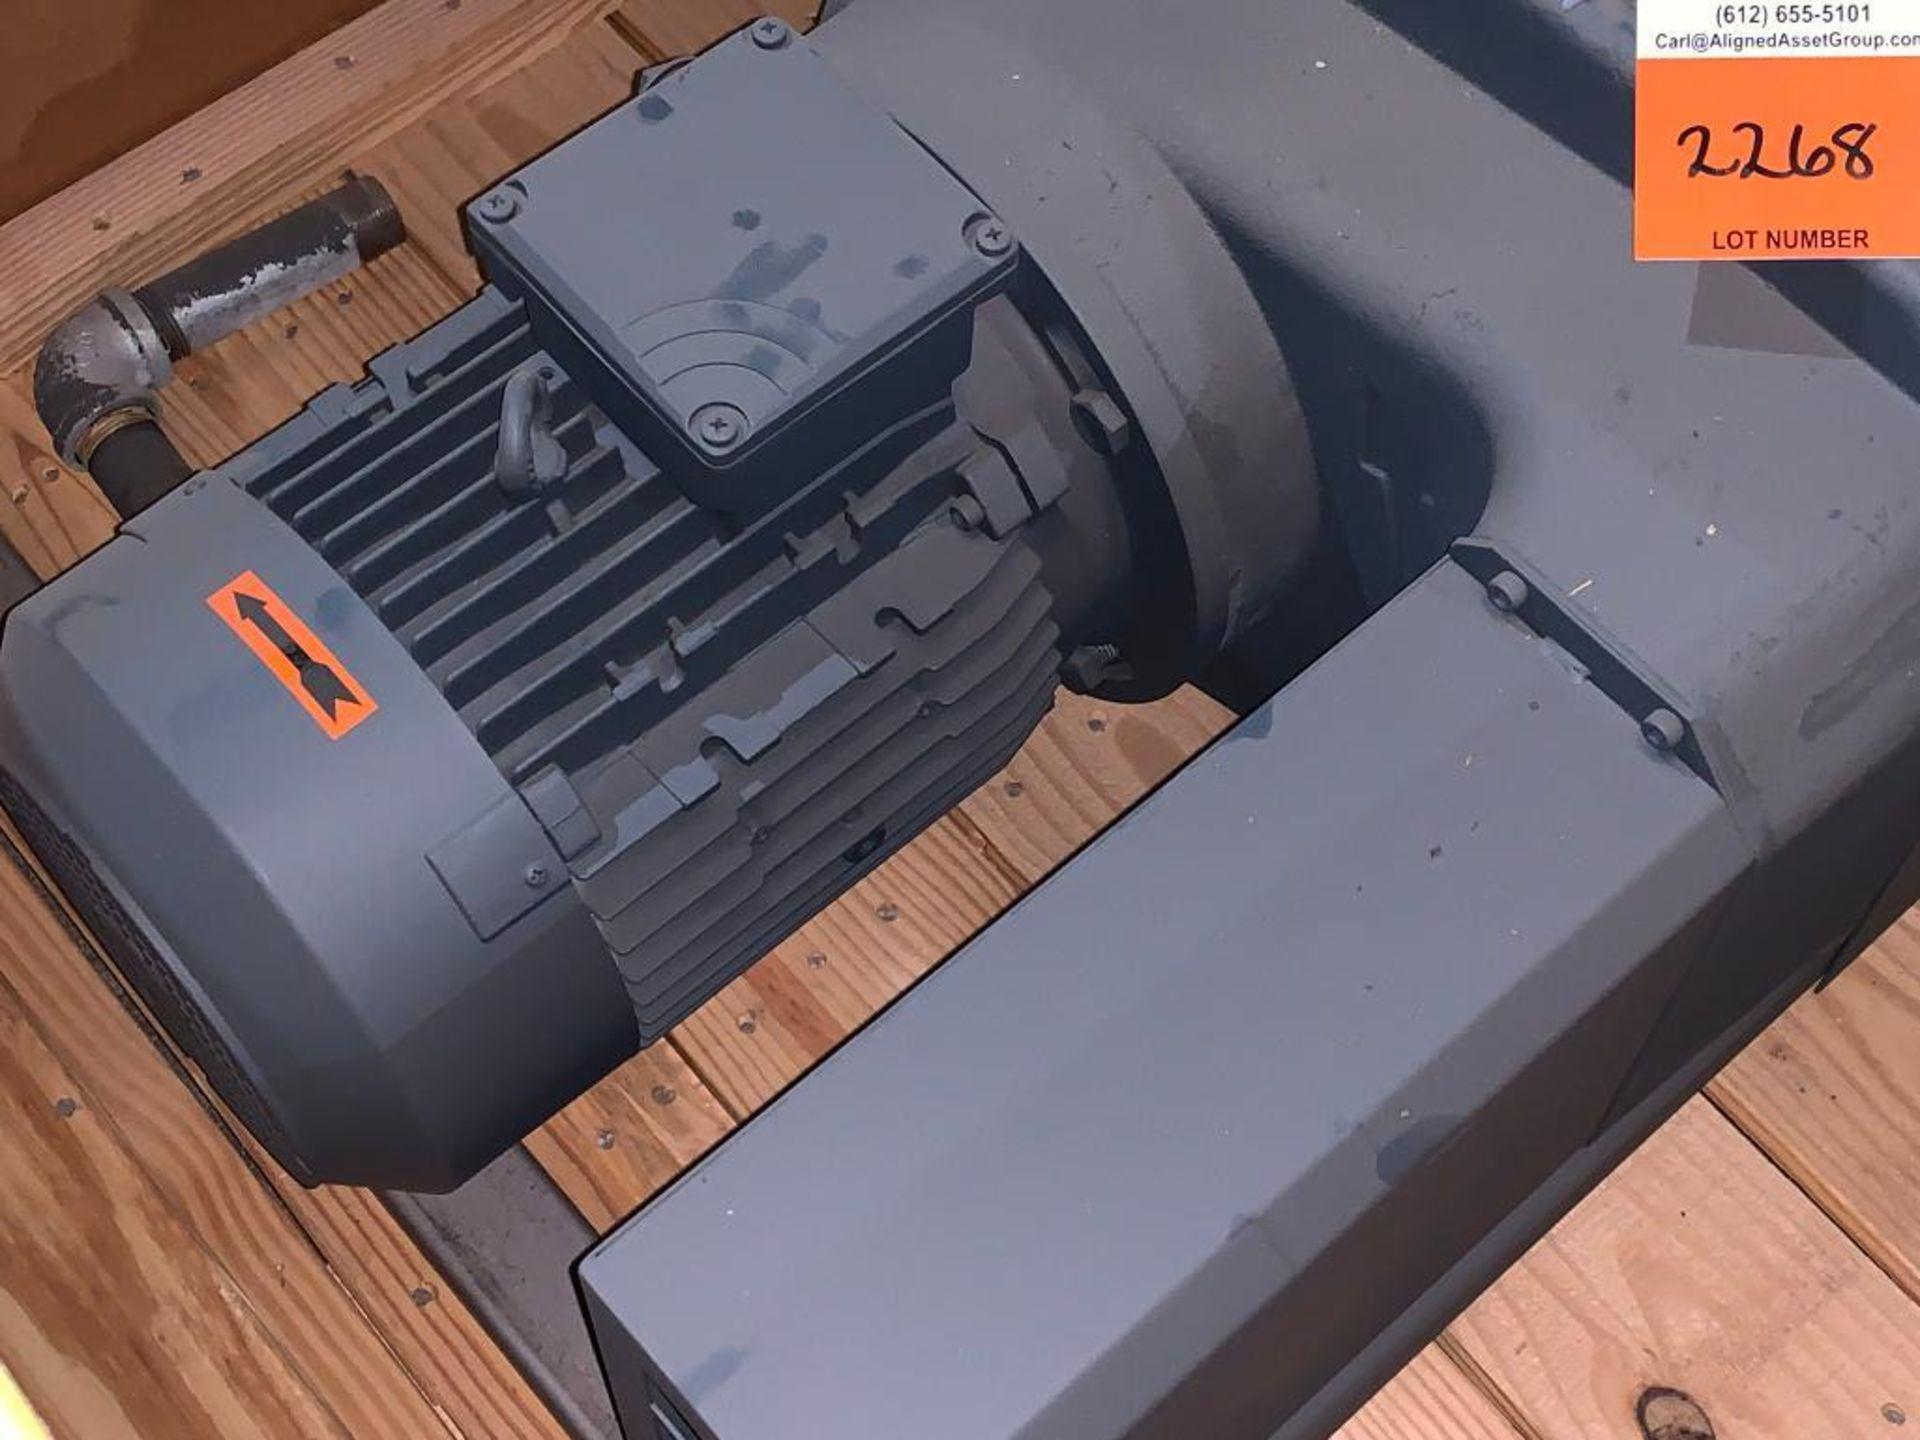 Busch vacuum pump - Image 4 of 5